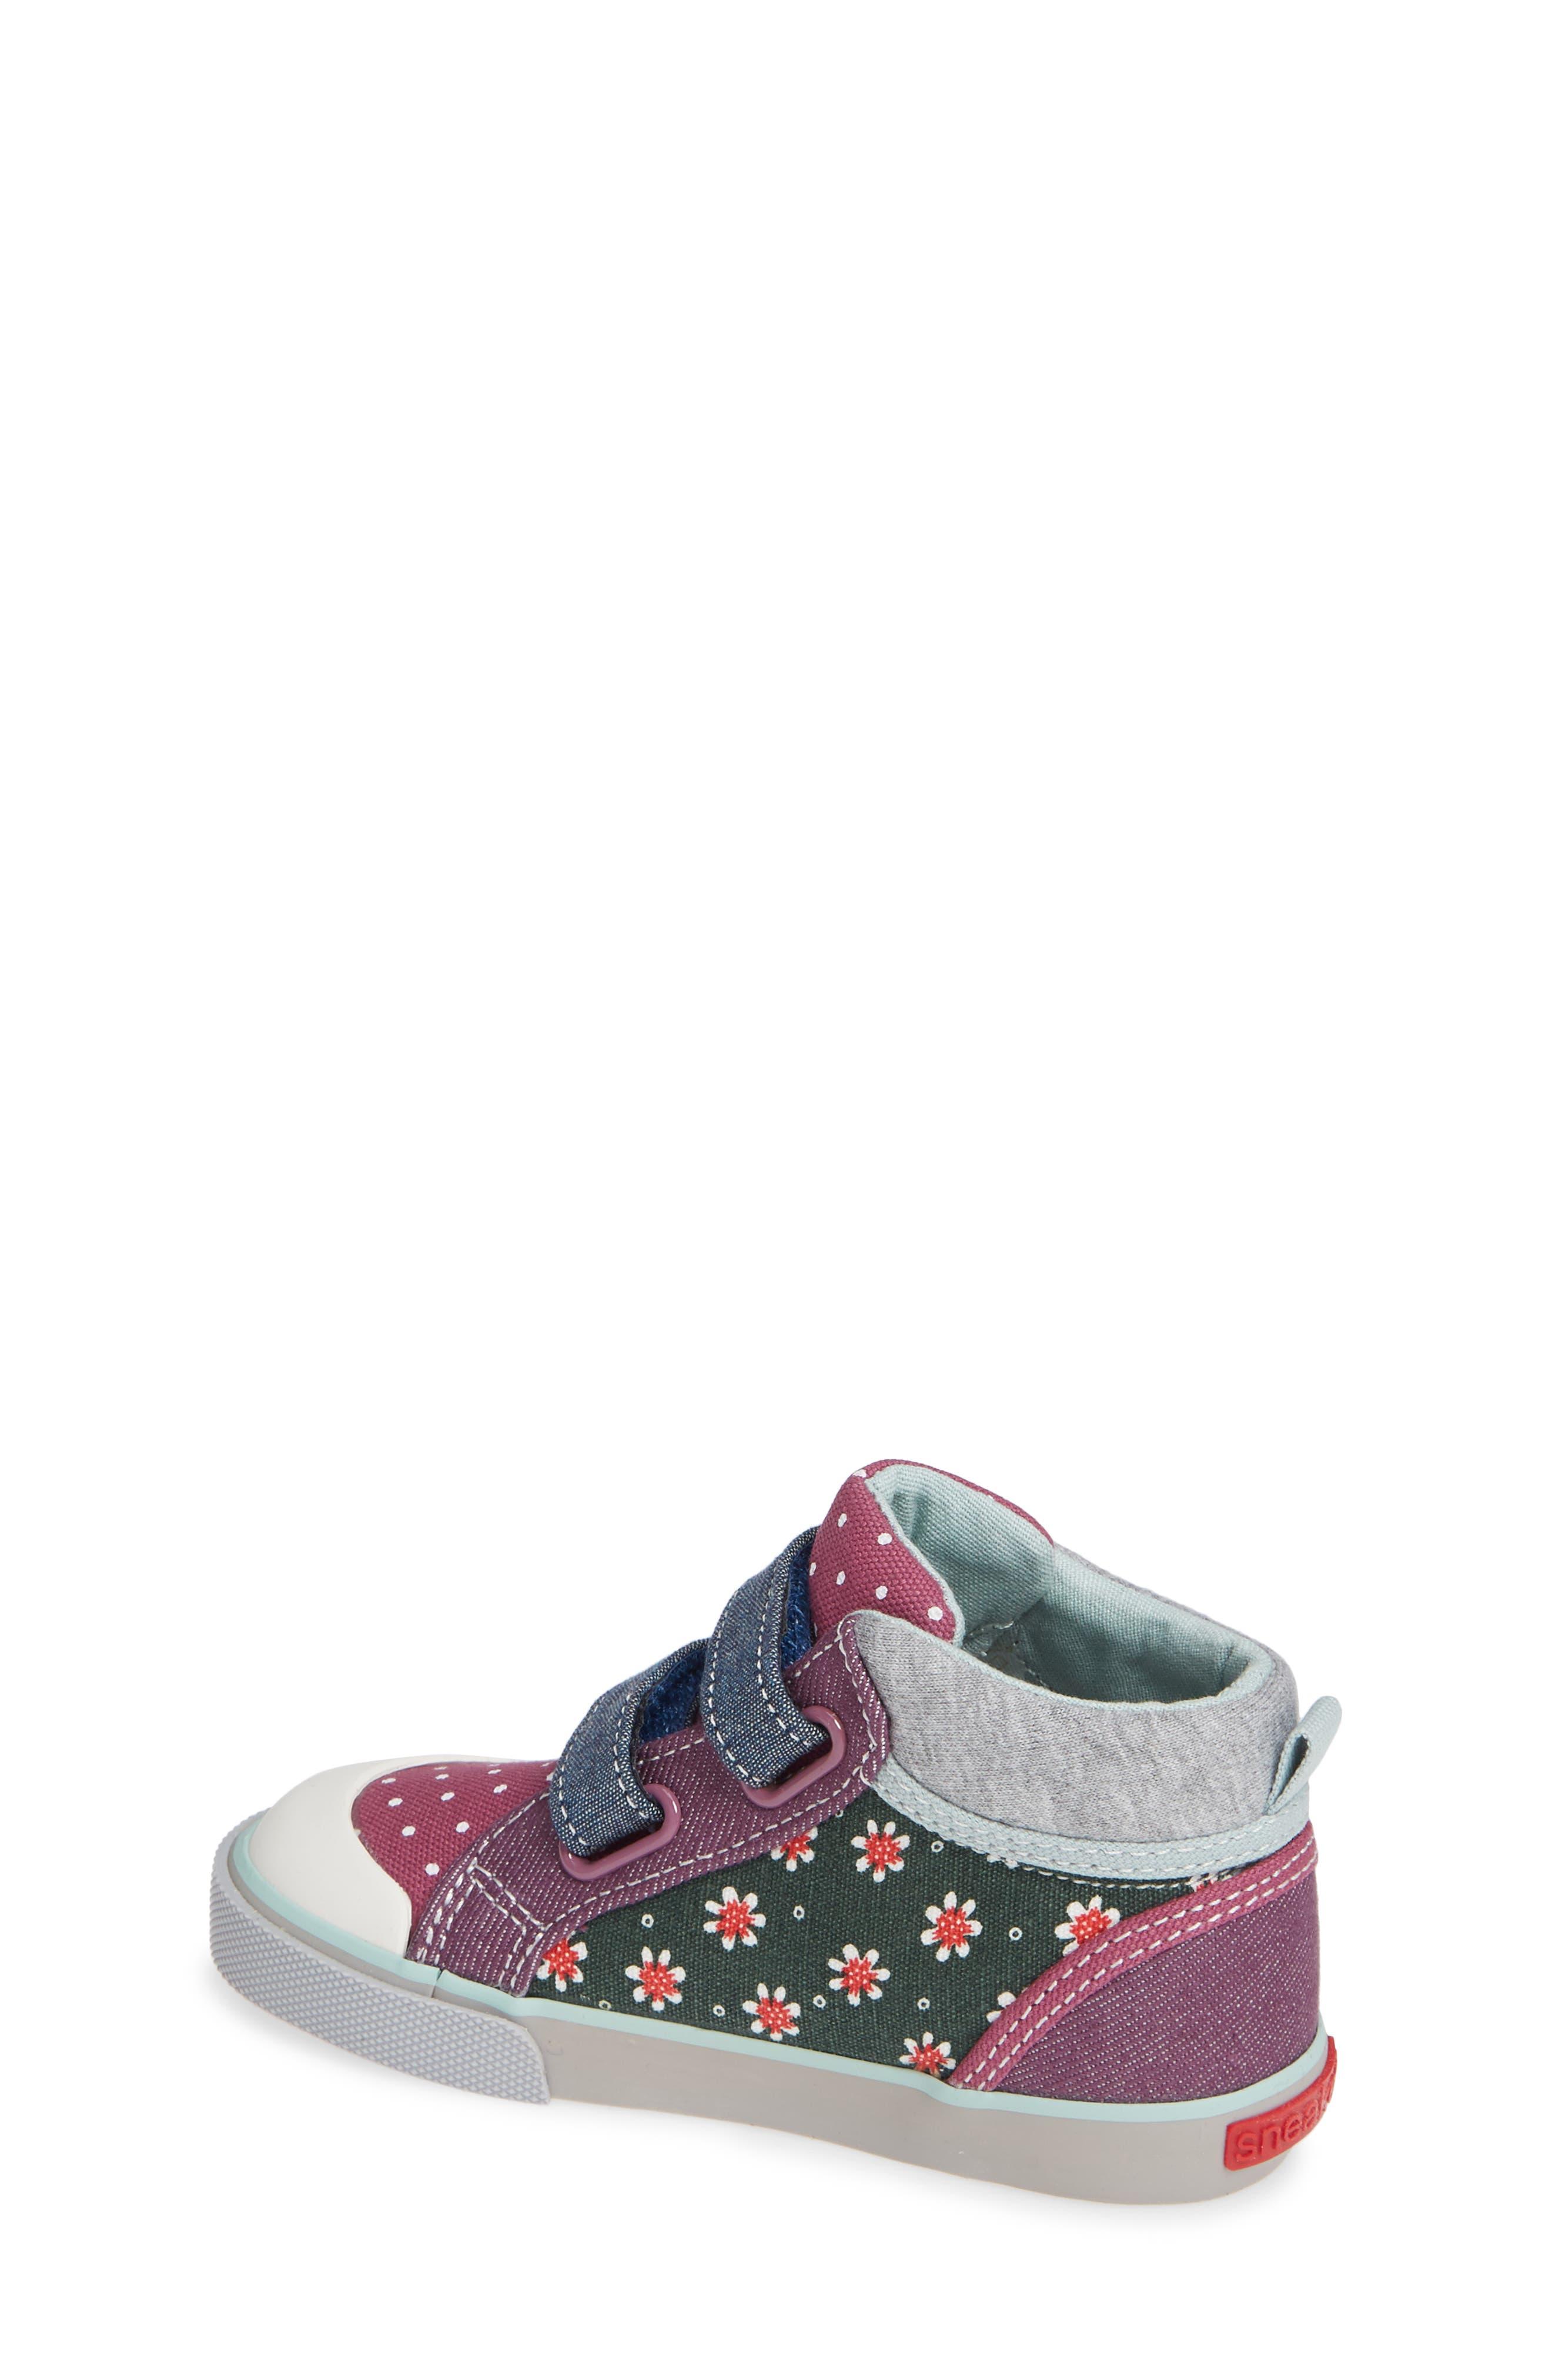 Kya Sneaker,                             Alternate thumbnail 2, color,                             GREEN FLORAL/MULTI